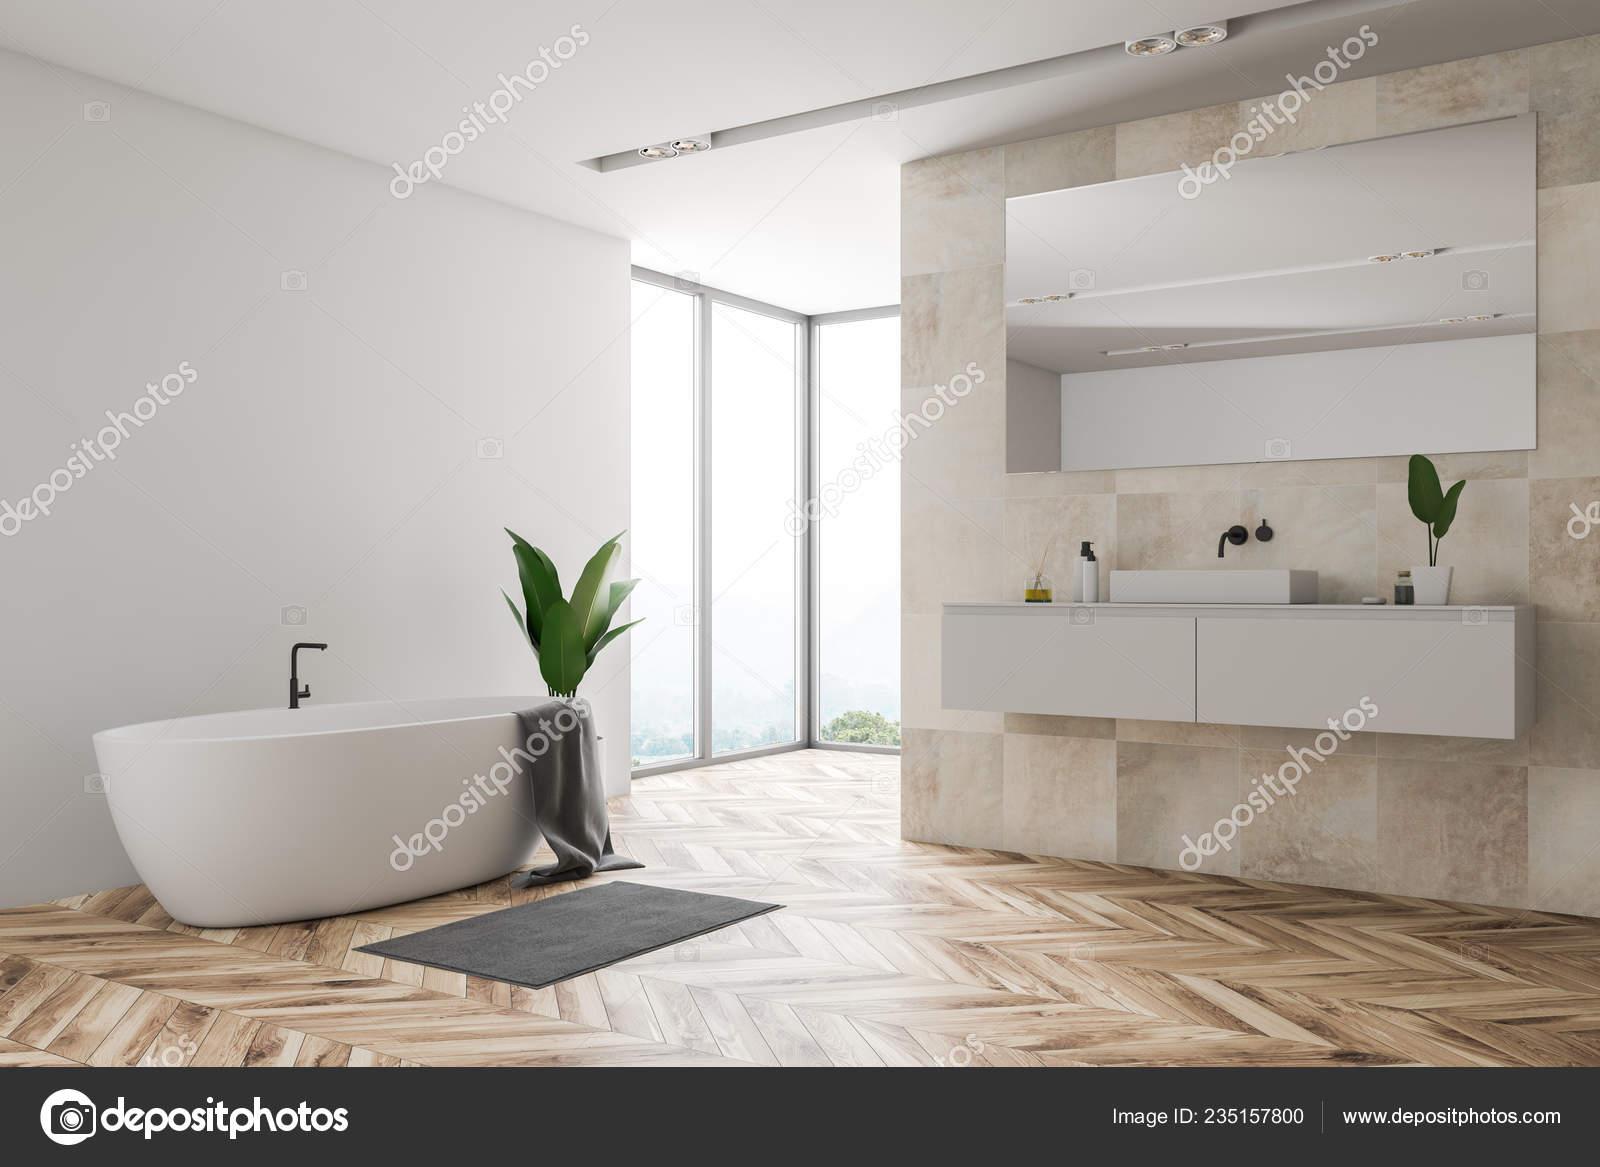 white wall tile bathroom